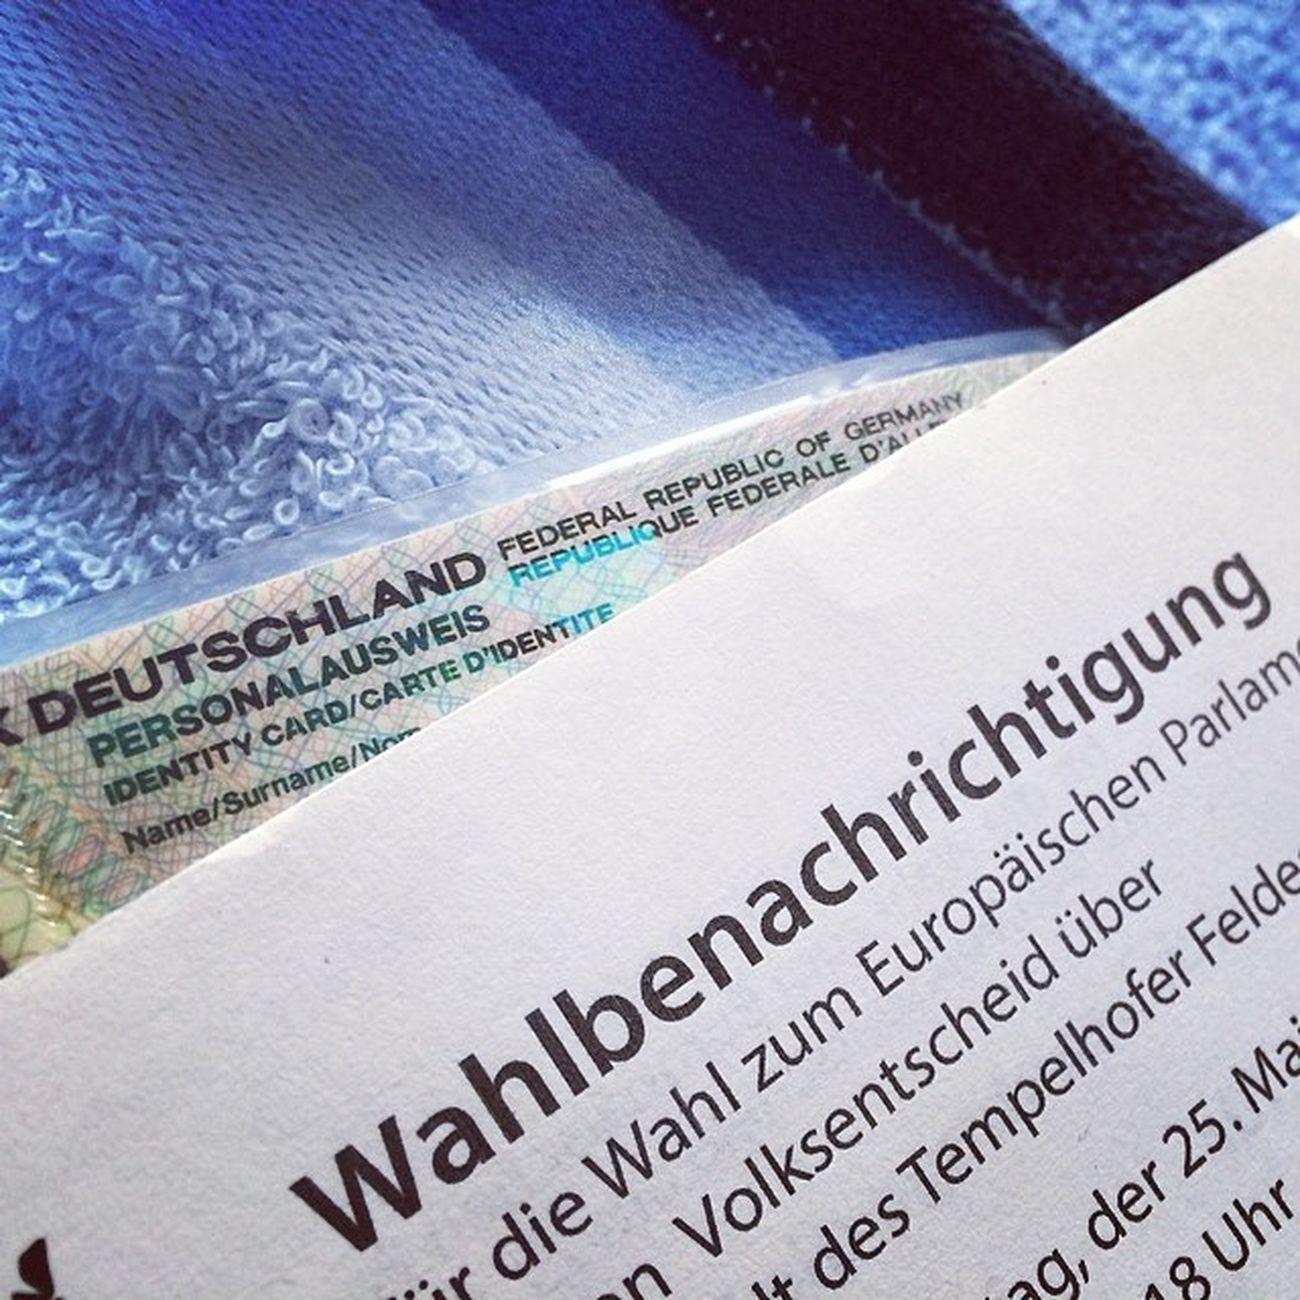 Alles dabei: Handtuch? Check!, Ausweis? Check!, Wahlbenachrichtigung? Check! #towel #towelday #berlin #ep2014